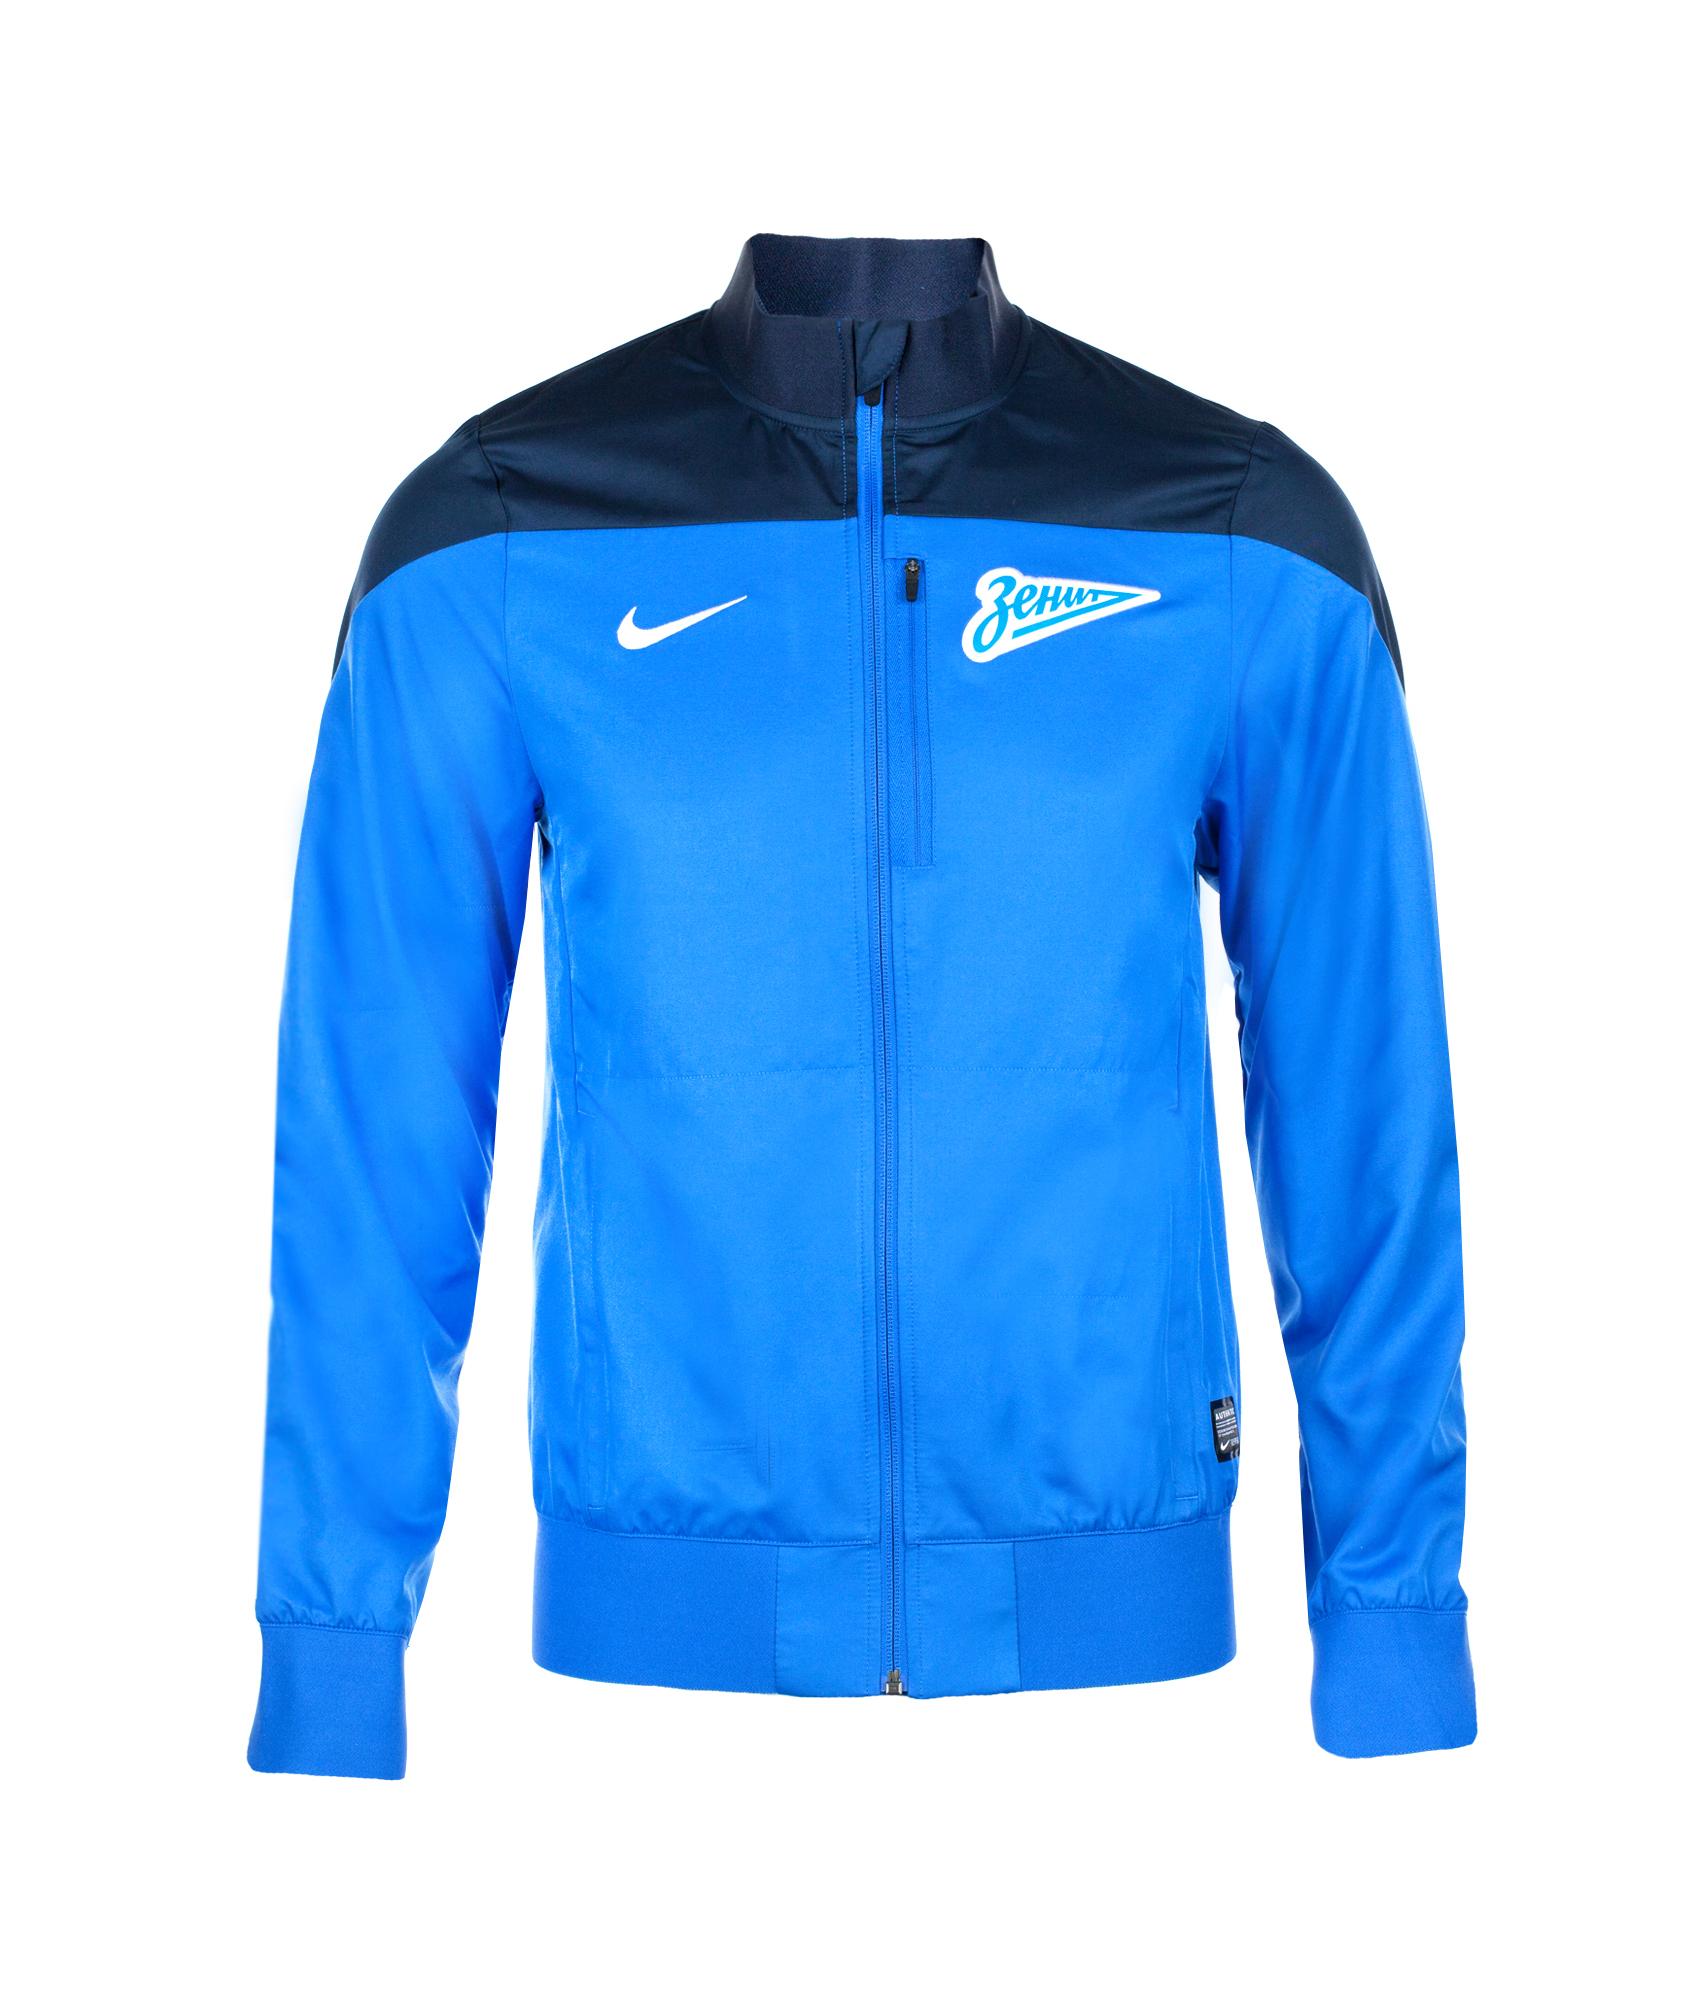 Куртка Nike Zenit Select SDLN WVN JKT, Цвет-Синий, Размер-S